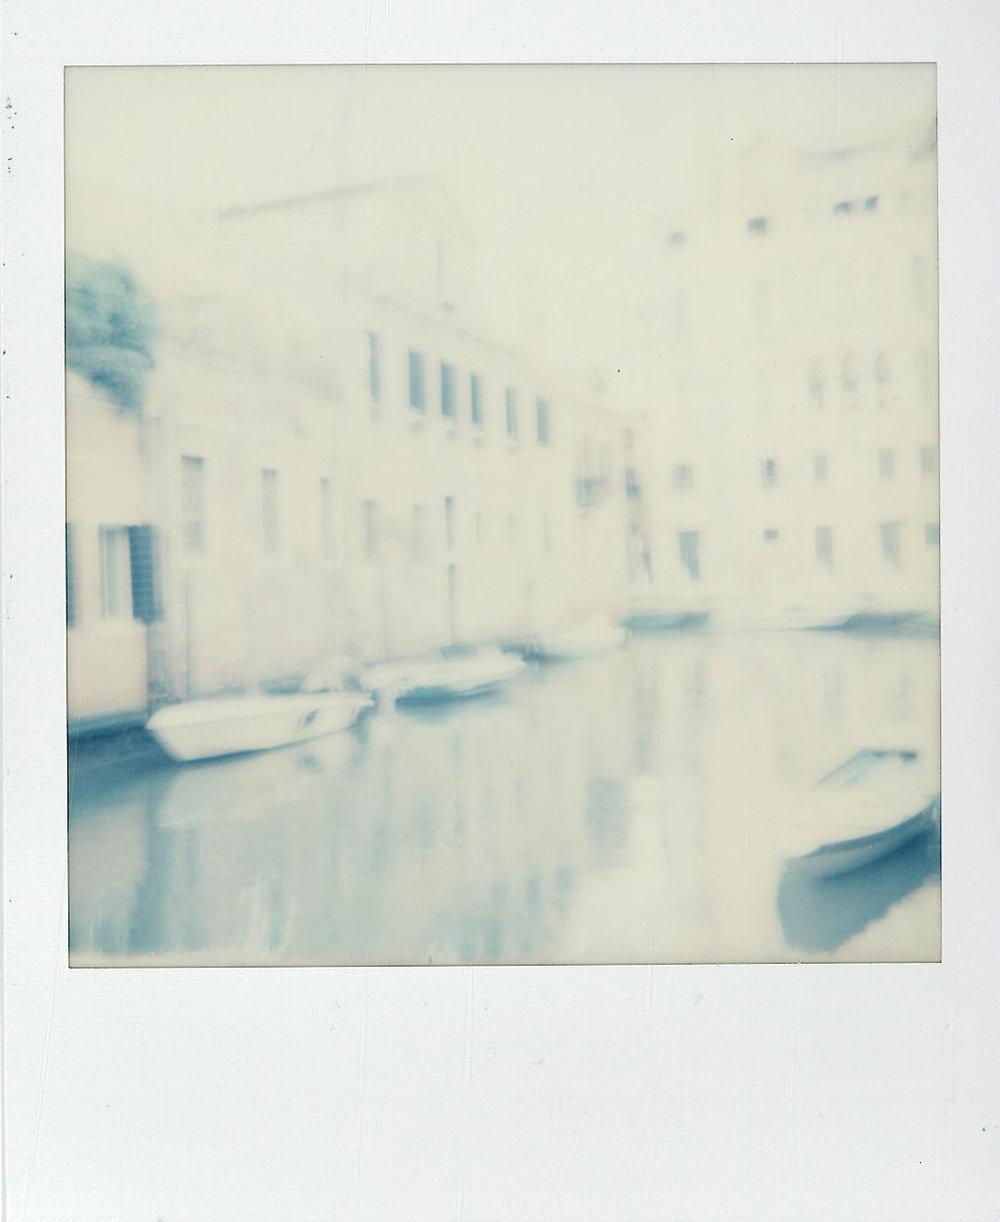 LDV_polaroid_venice_4.jpg